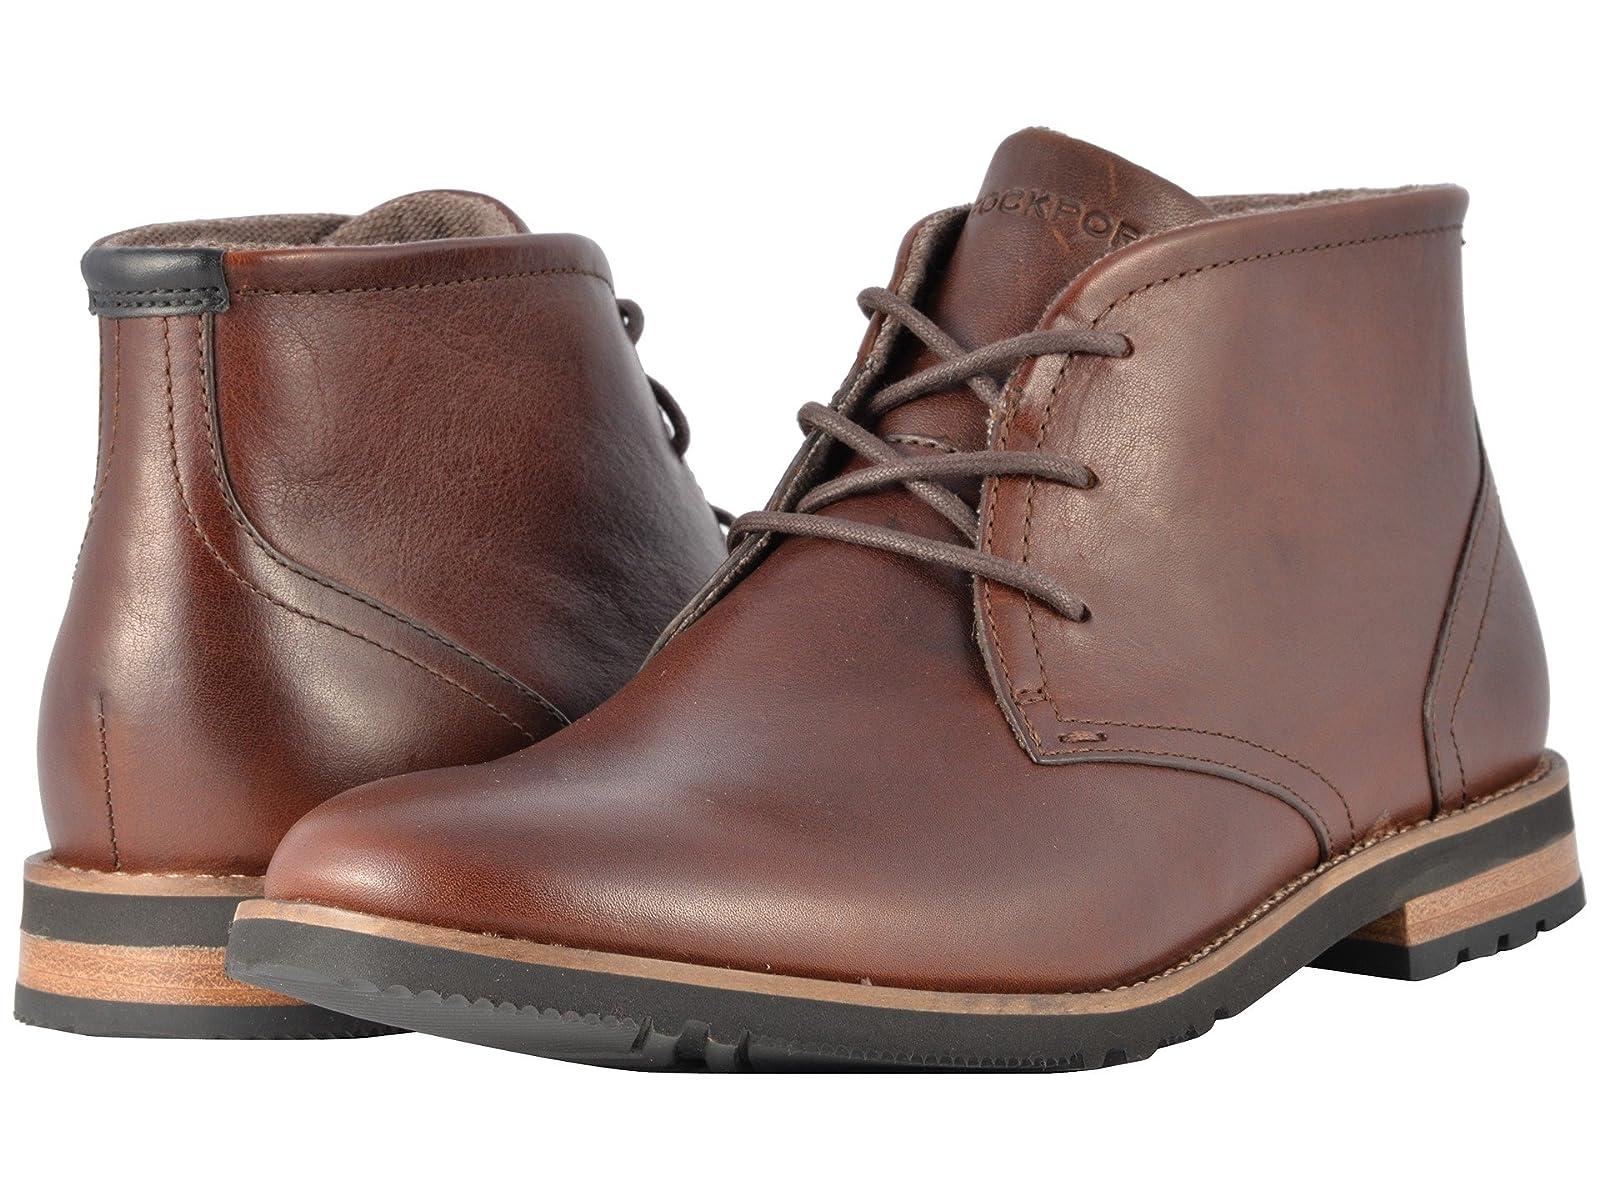 Rockport Ledge Hill 2 Chukka BootCheap and distinctive eye-catching shoes